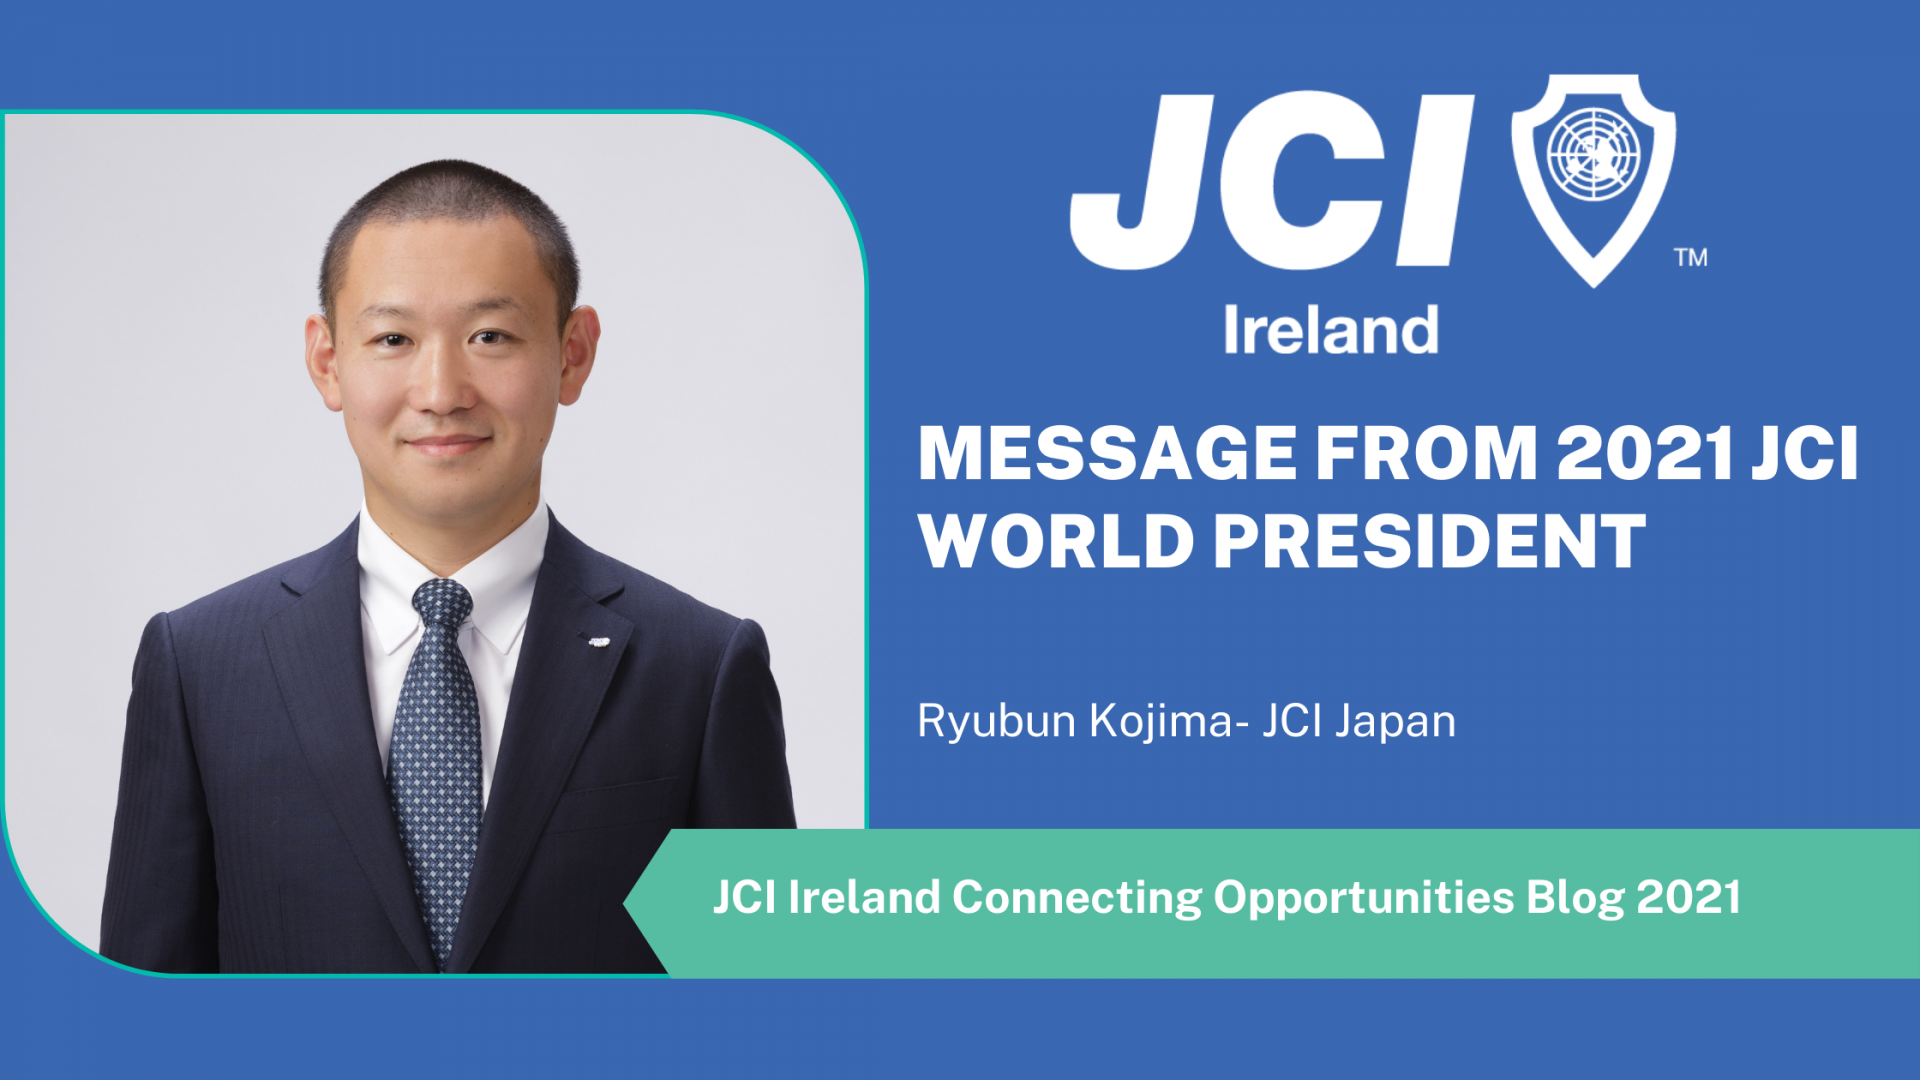 Message from 2021 JCI World President